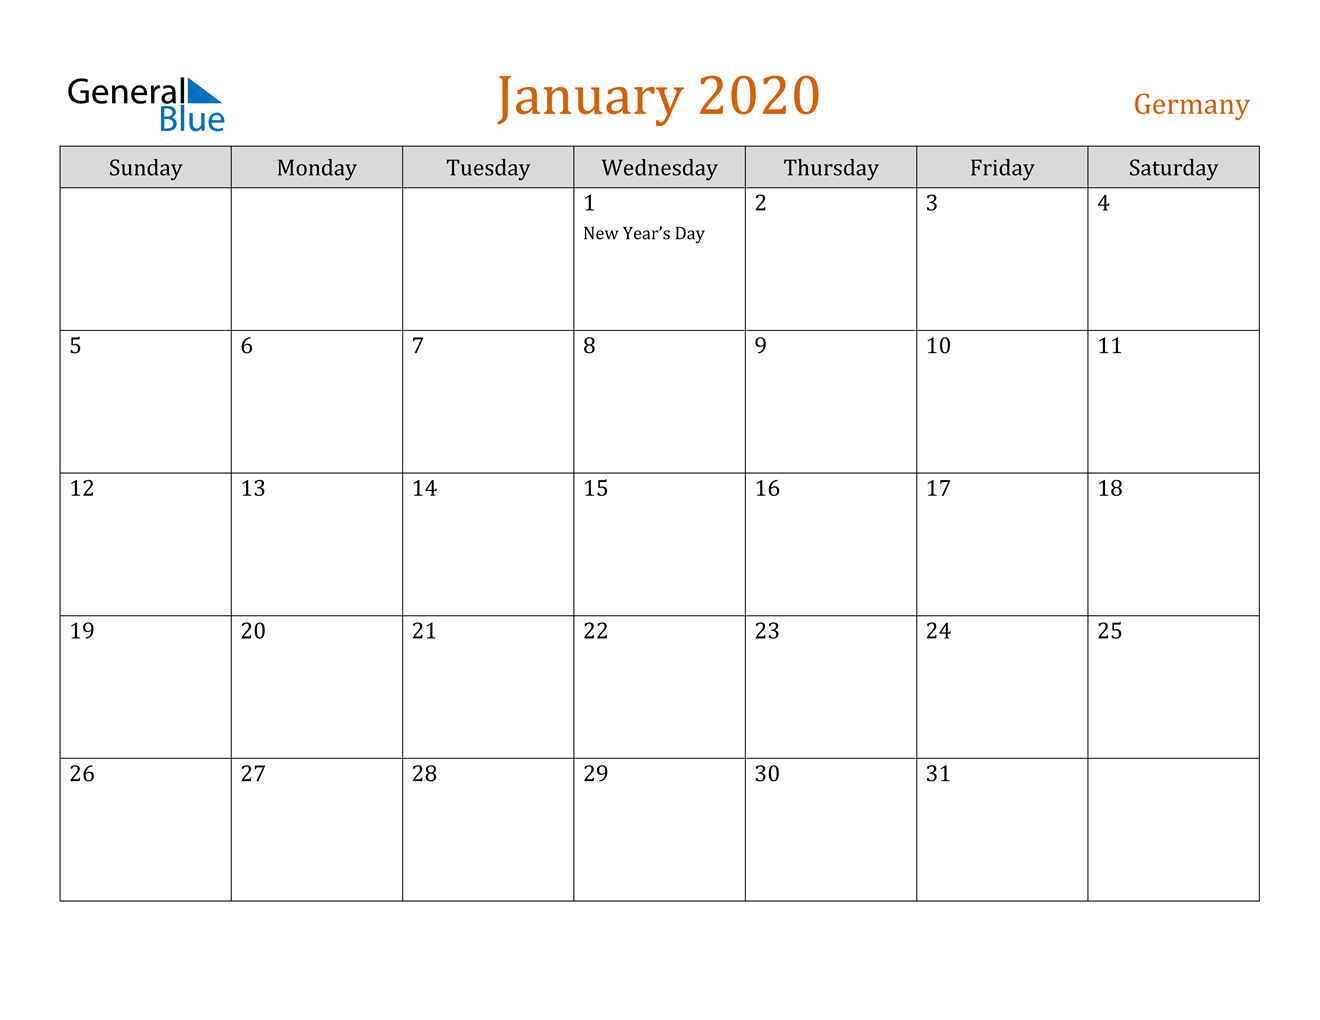 January 2020 Calendar - Germany